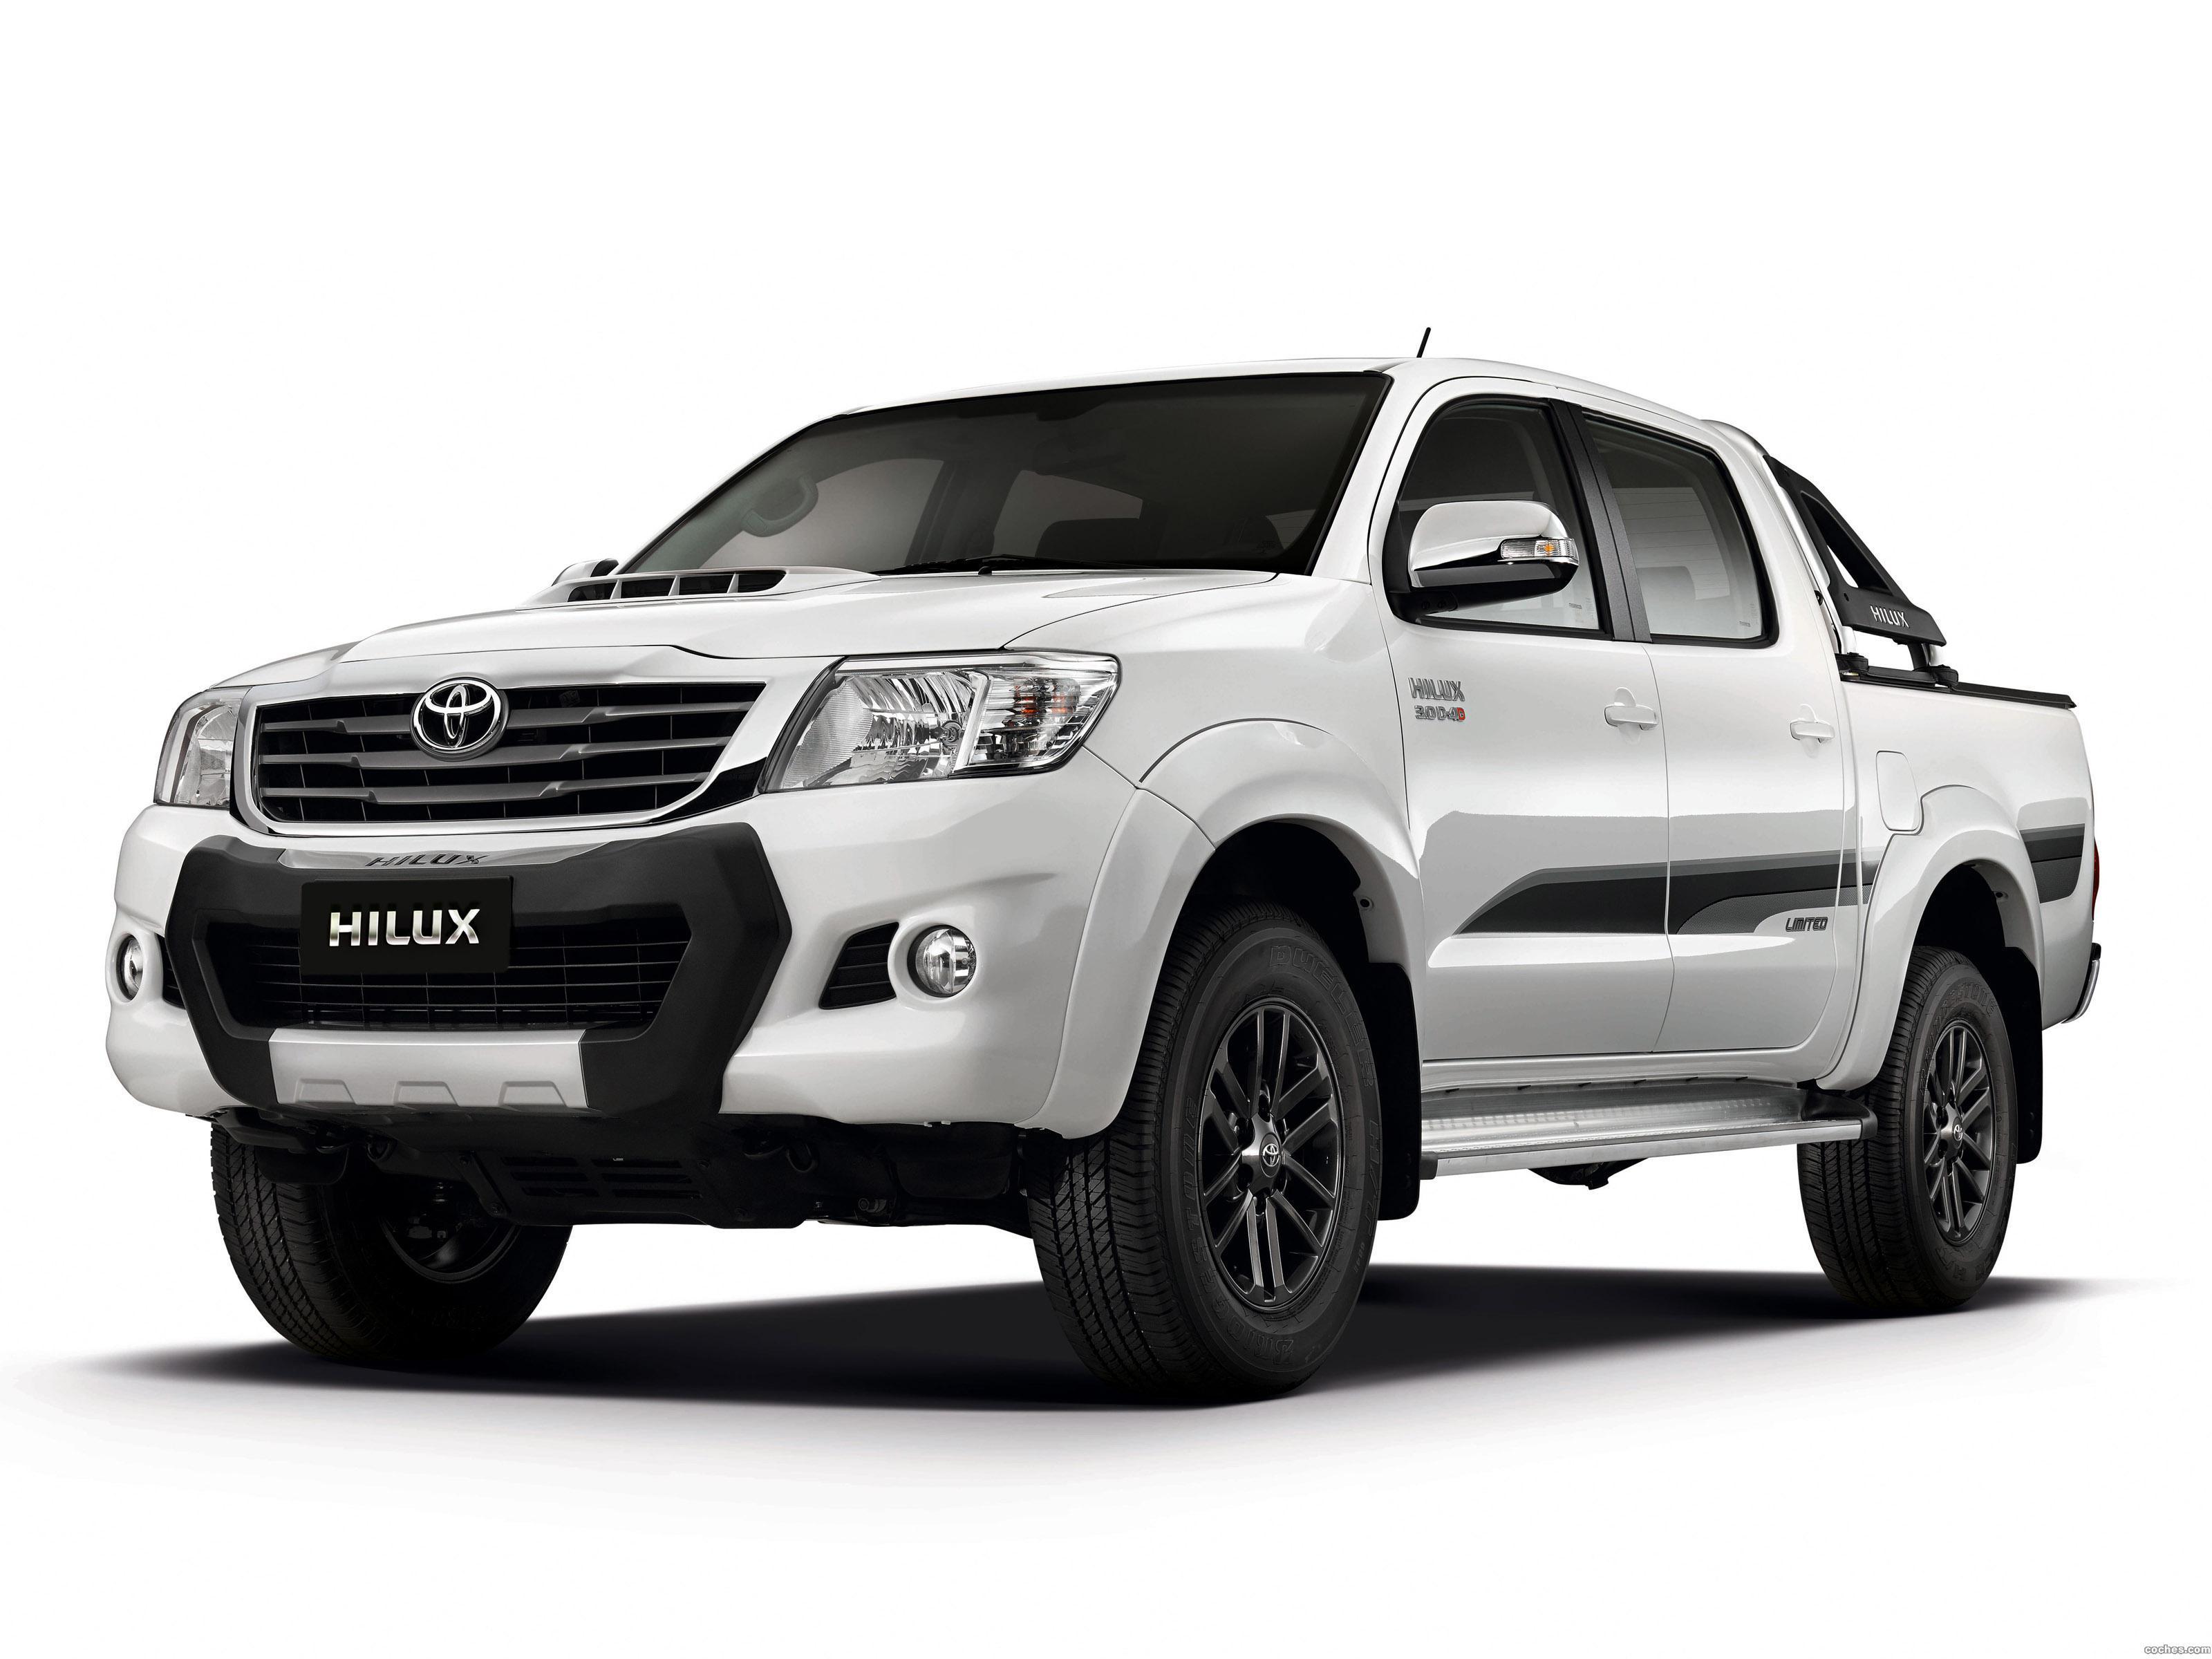 Foto 0 de Toyota Hilux SRV Cabine Dupla 4x4 Limited  2014